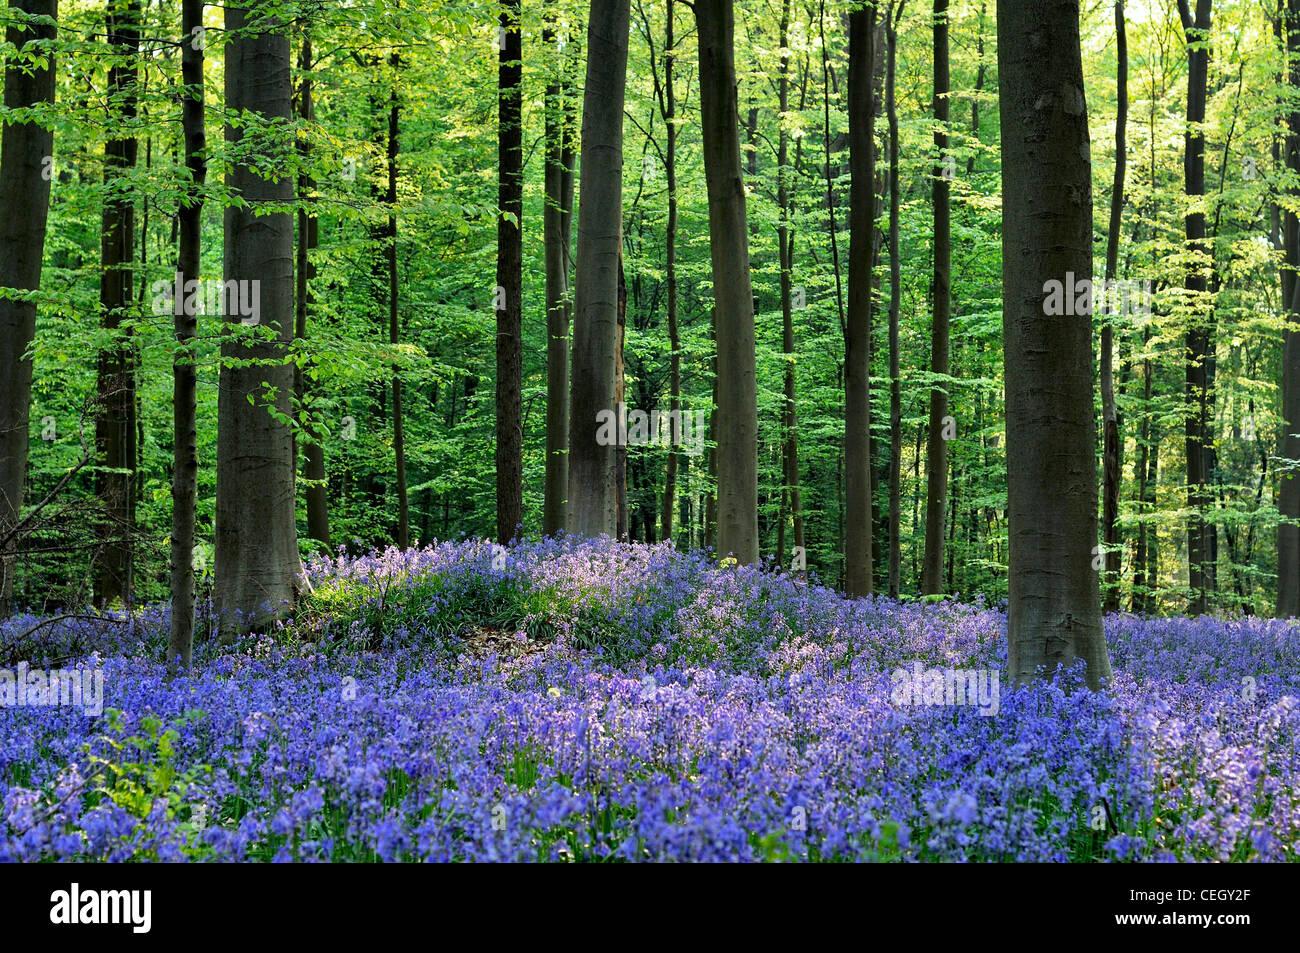 Bluebells (Endymion nonscriptus) in beech woodland (Fagus sylvatica), Hallerbos, Belgium - Stock Image